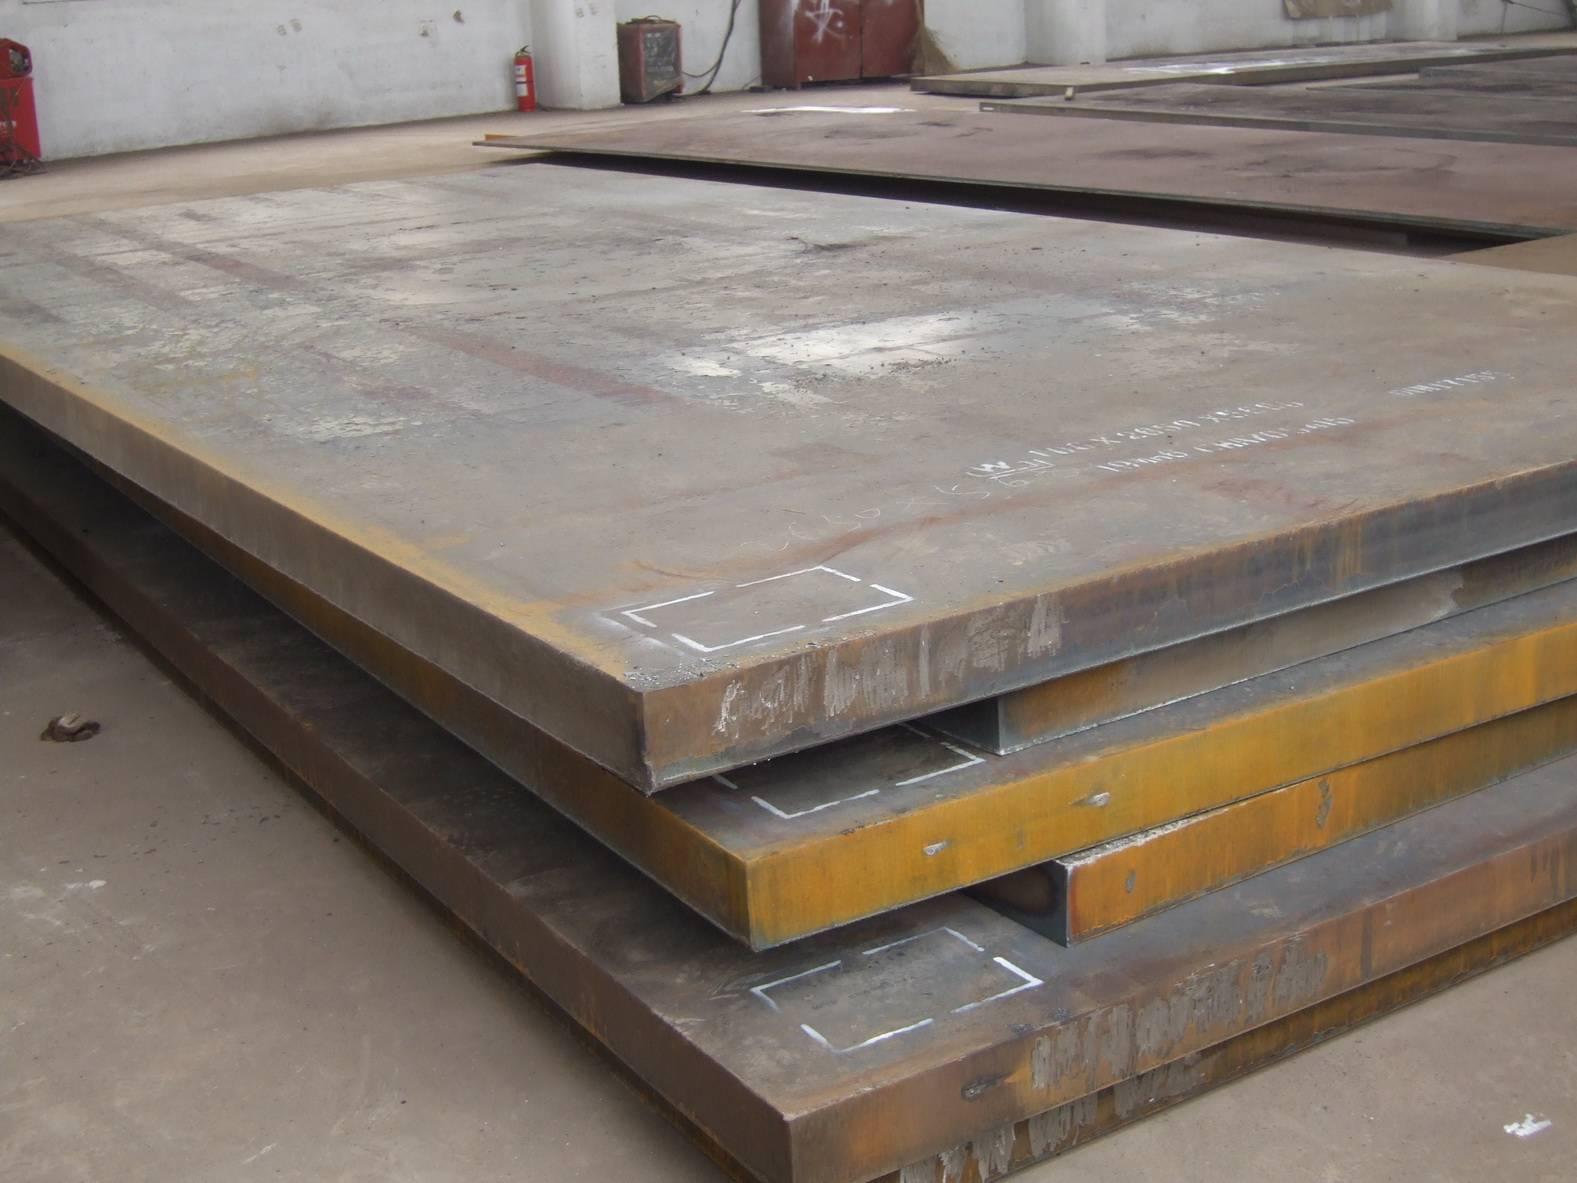 abs and dnv shipbuilding steel plate A,B,D,E,AH32,AH36,AH40,API 2HGr45,2HGr50